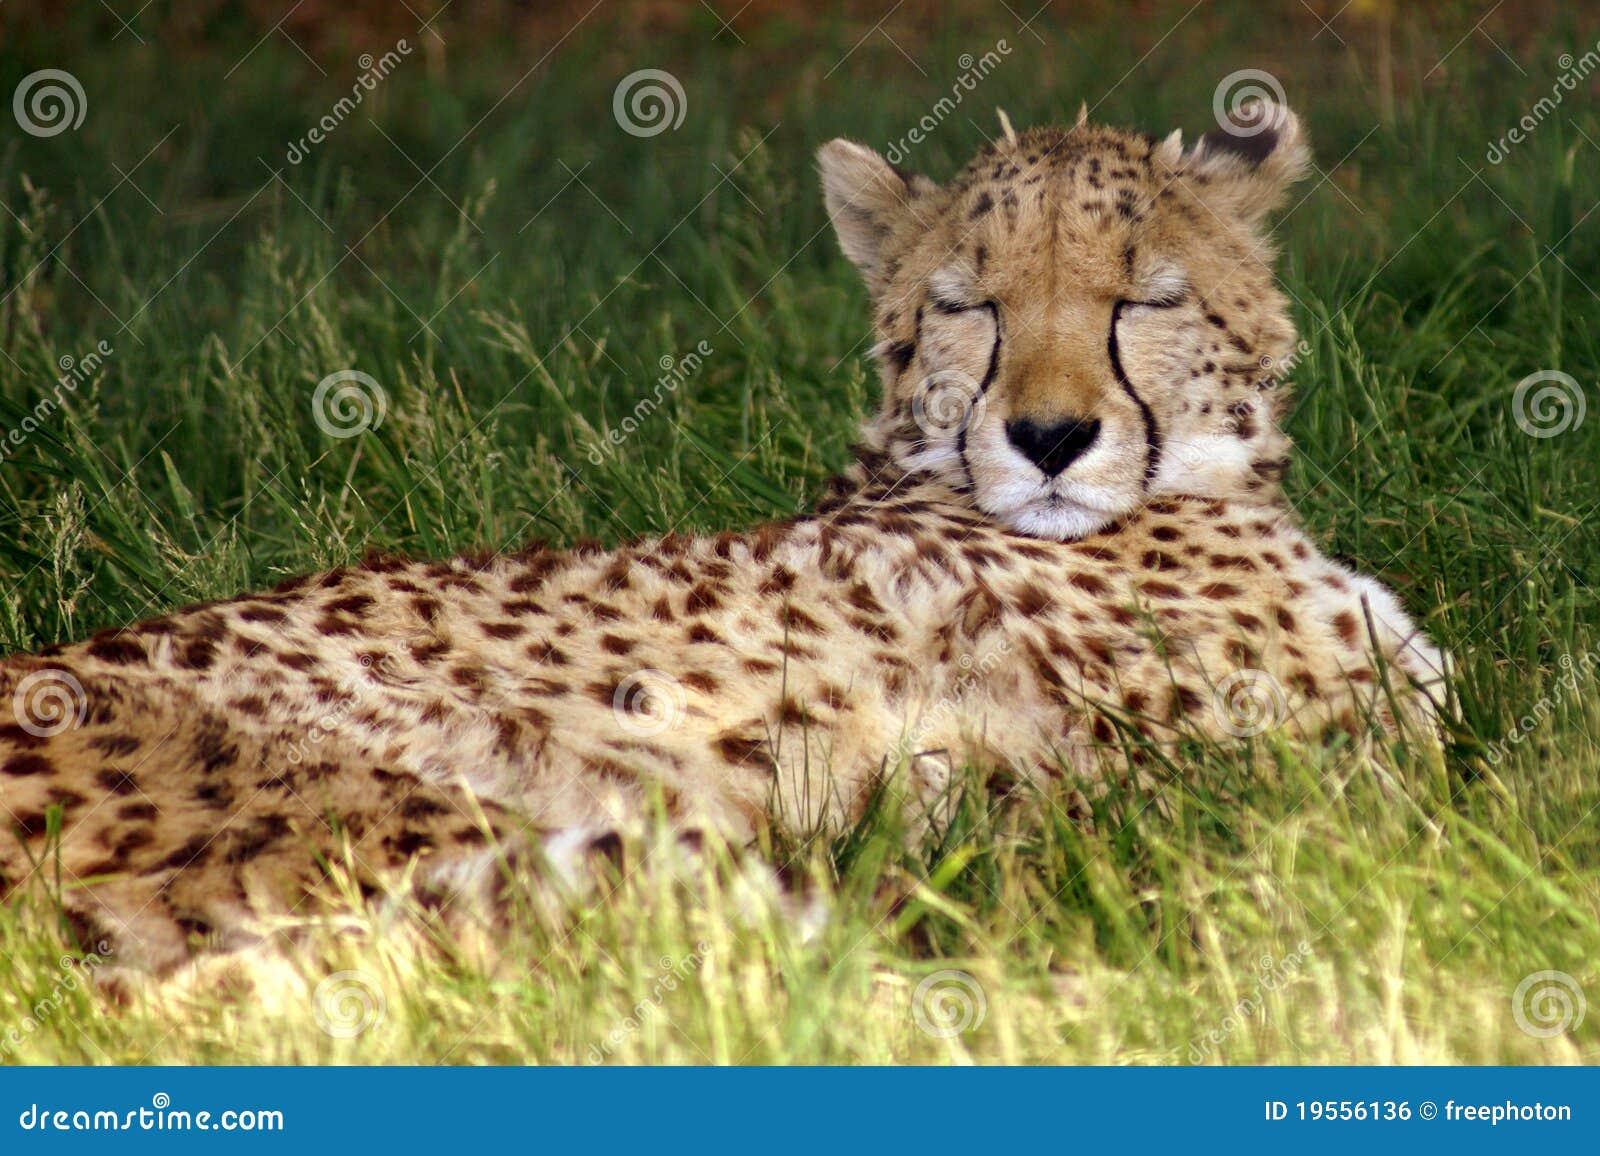 sleeping cheetah stock photo image of wild dreamy half 19556136